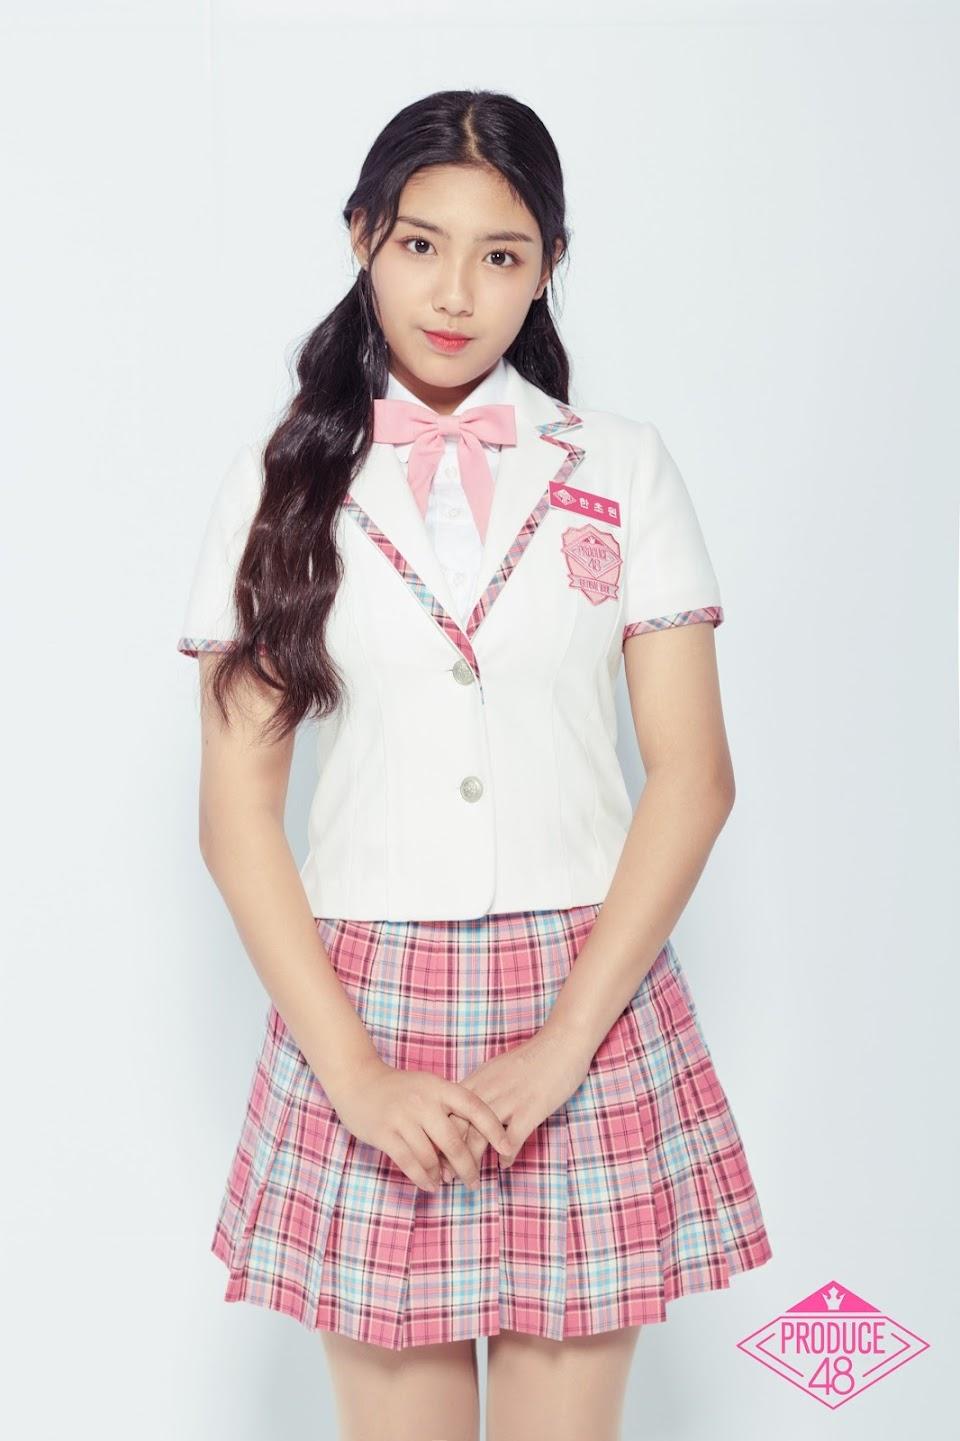 Han_Chowon_Produce_48